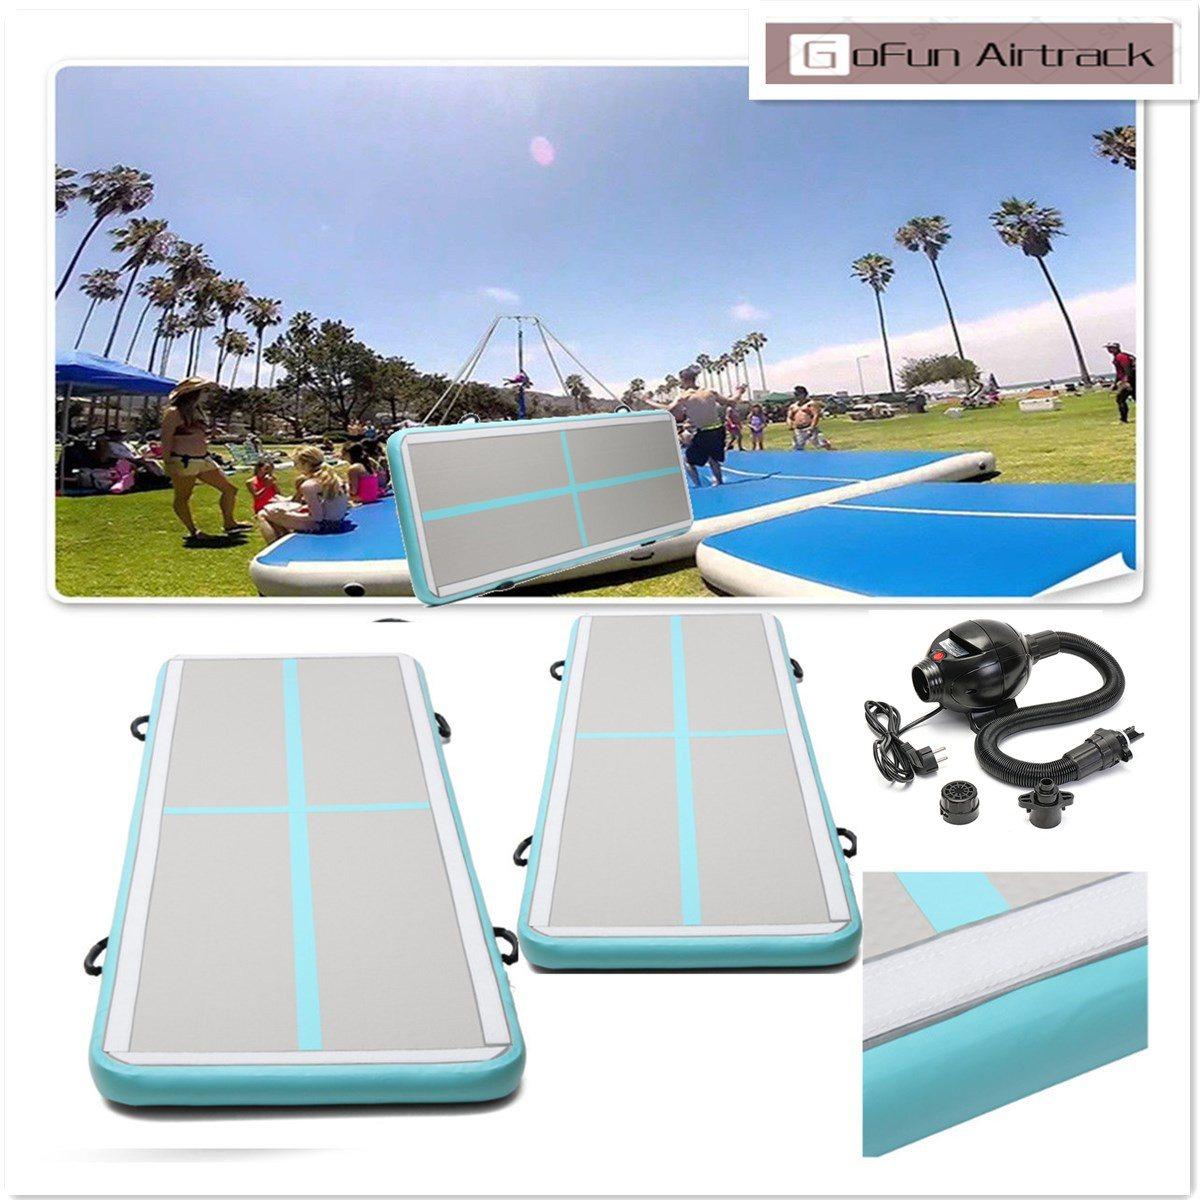 Newest 100x300x10cm Inflatable Tumble Track Trampoline Air Track Taekwondo Gymnastics Inflatable Air Mat With pump все цены